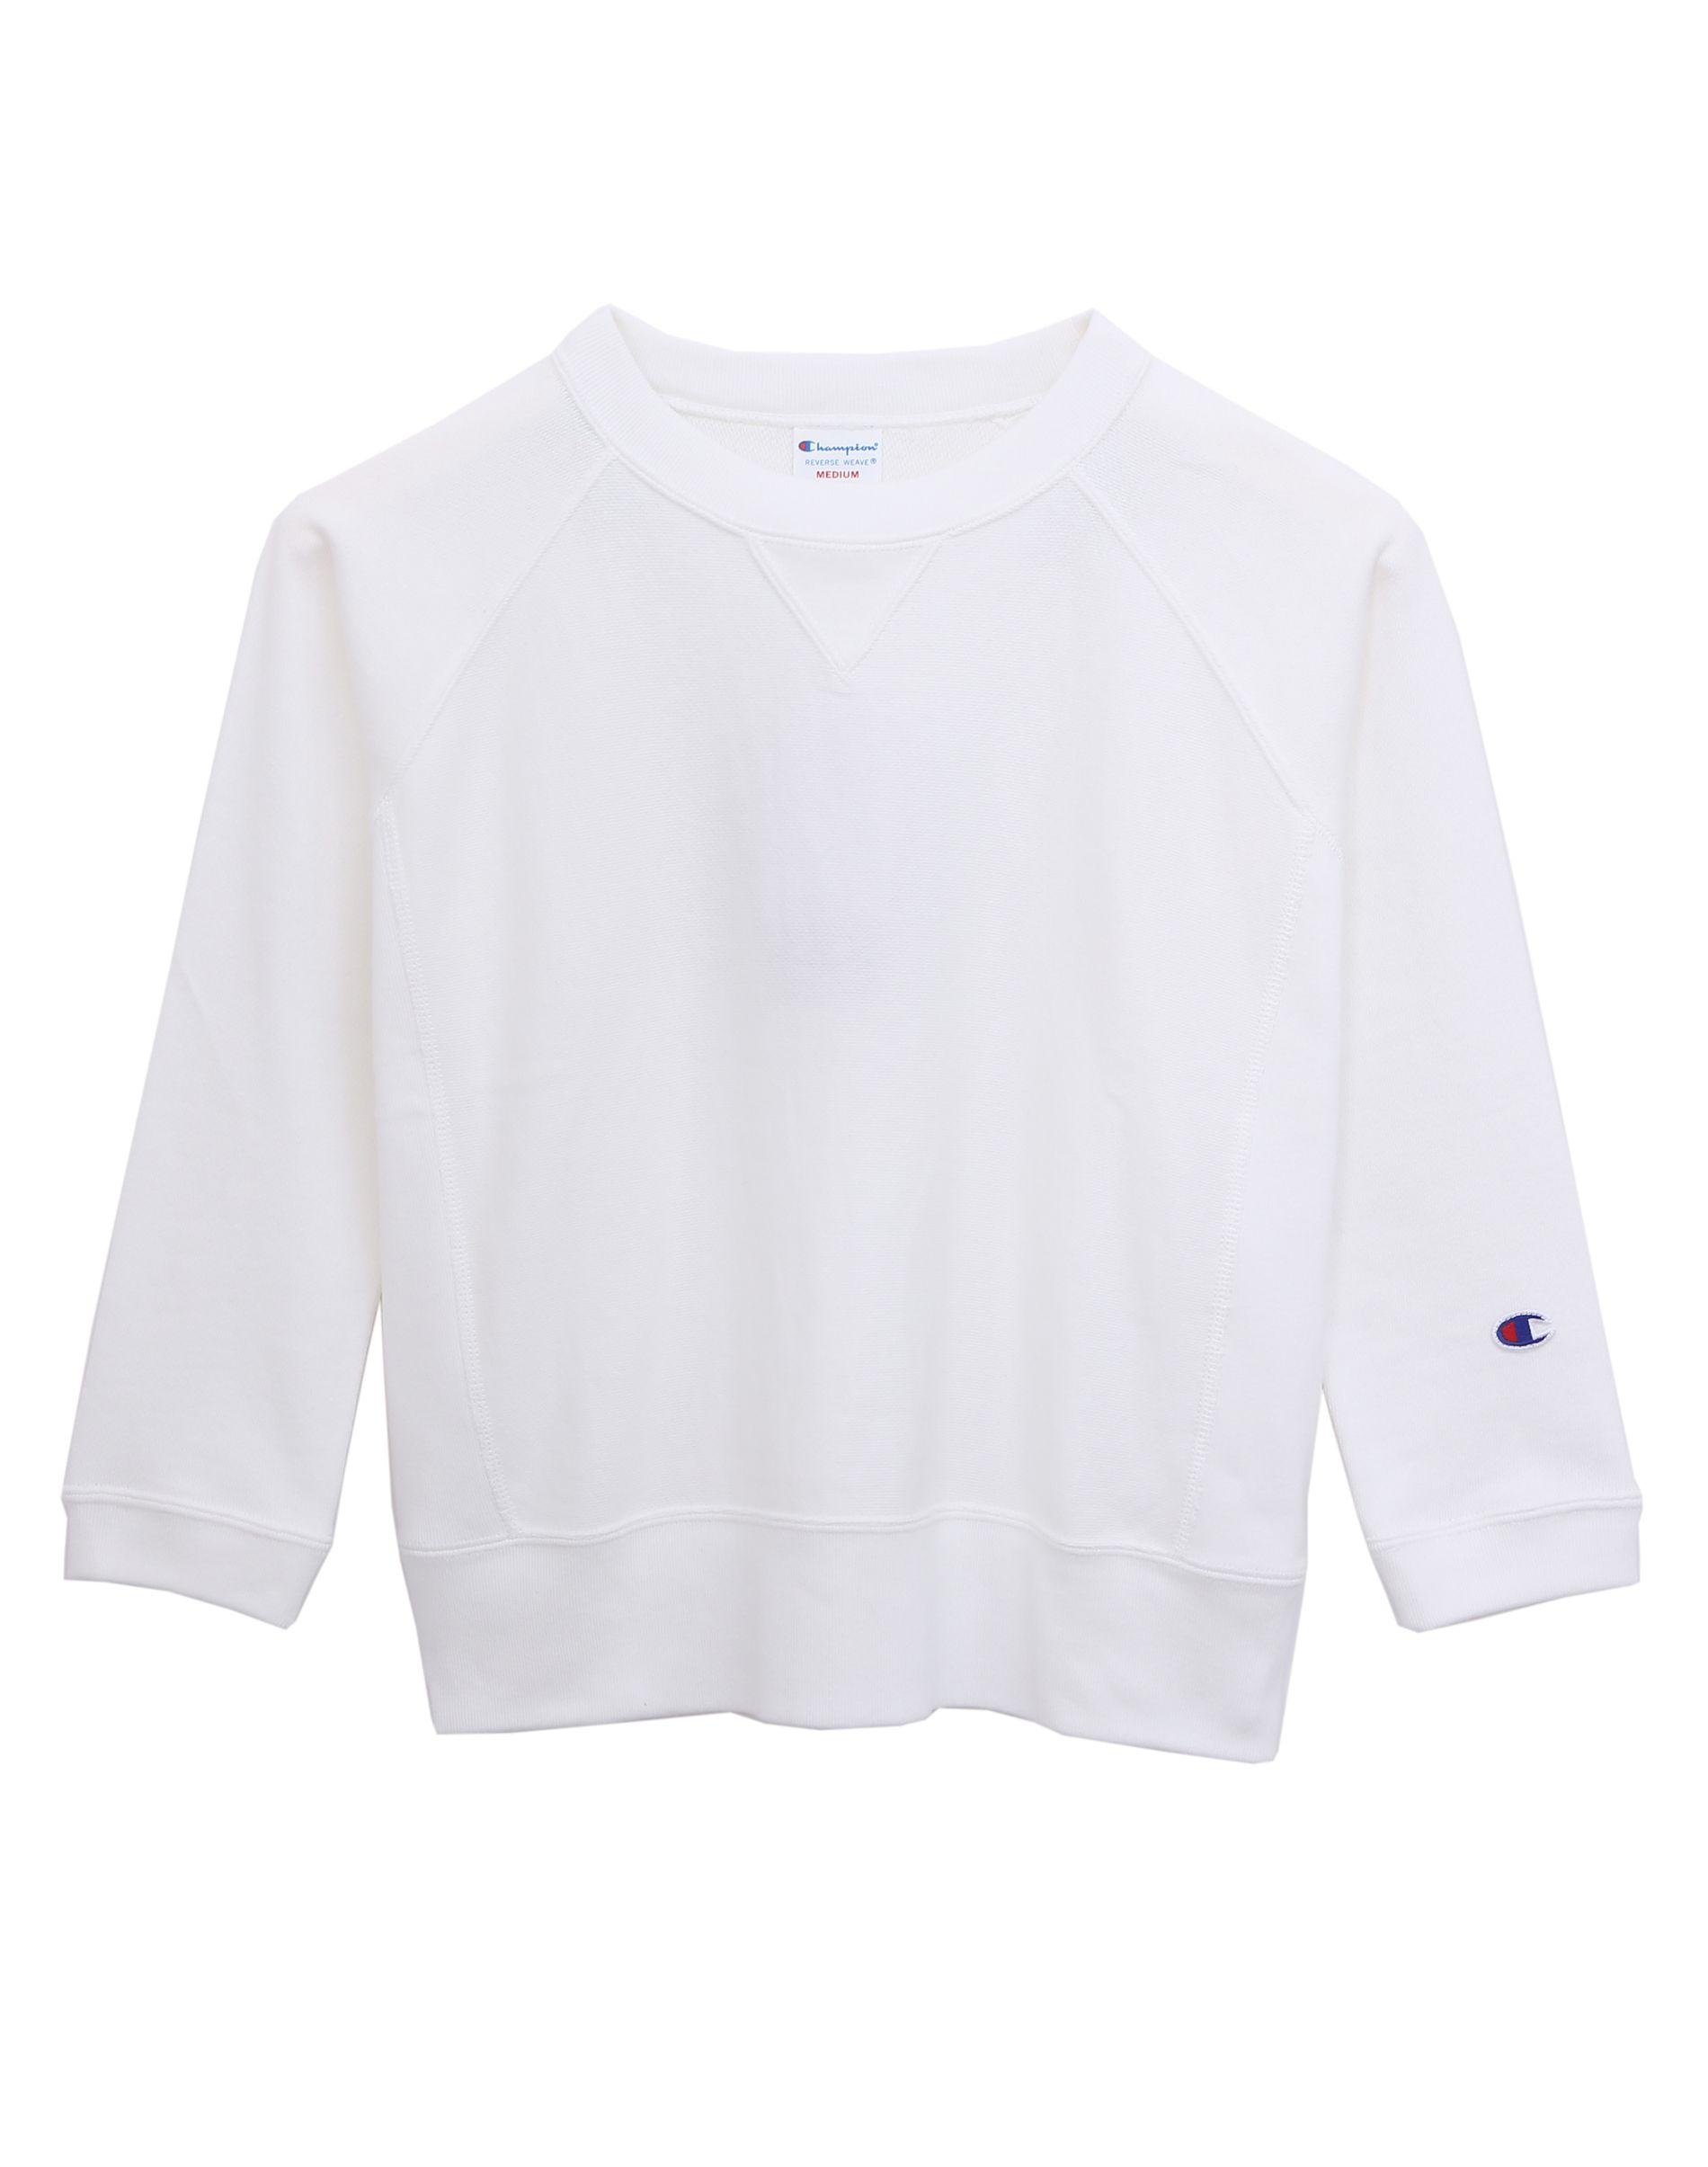 421daf3d6db8 Lyst - Champion Japan Premium Reverse Weave® Raglan Sleeve ...